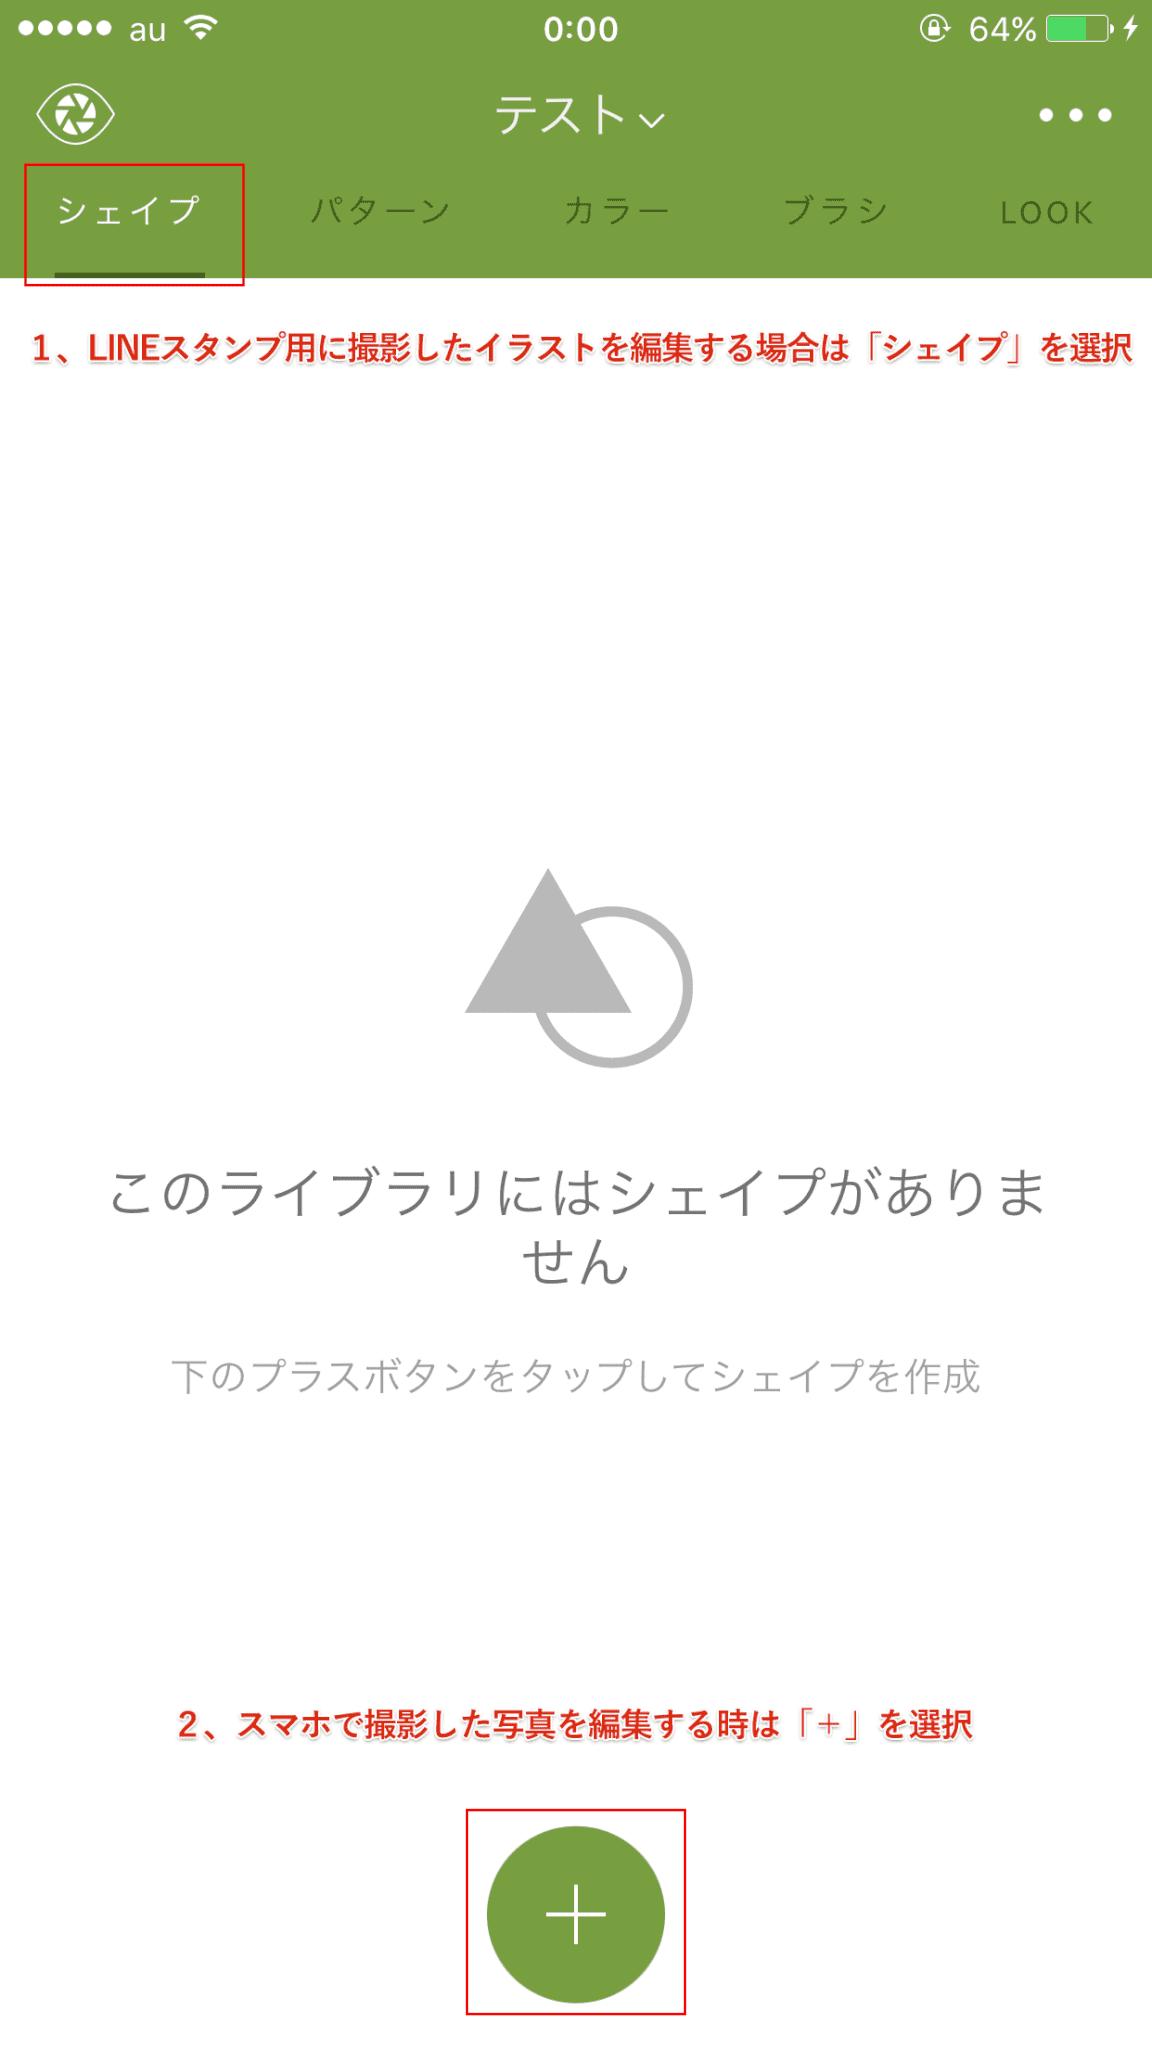 Adobe Captureのアプリ画面を開いた時